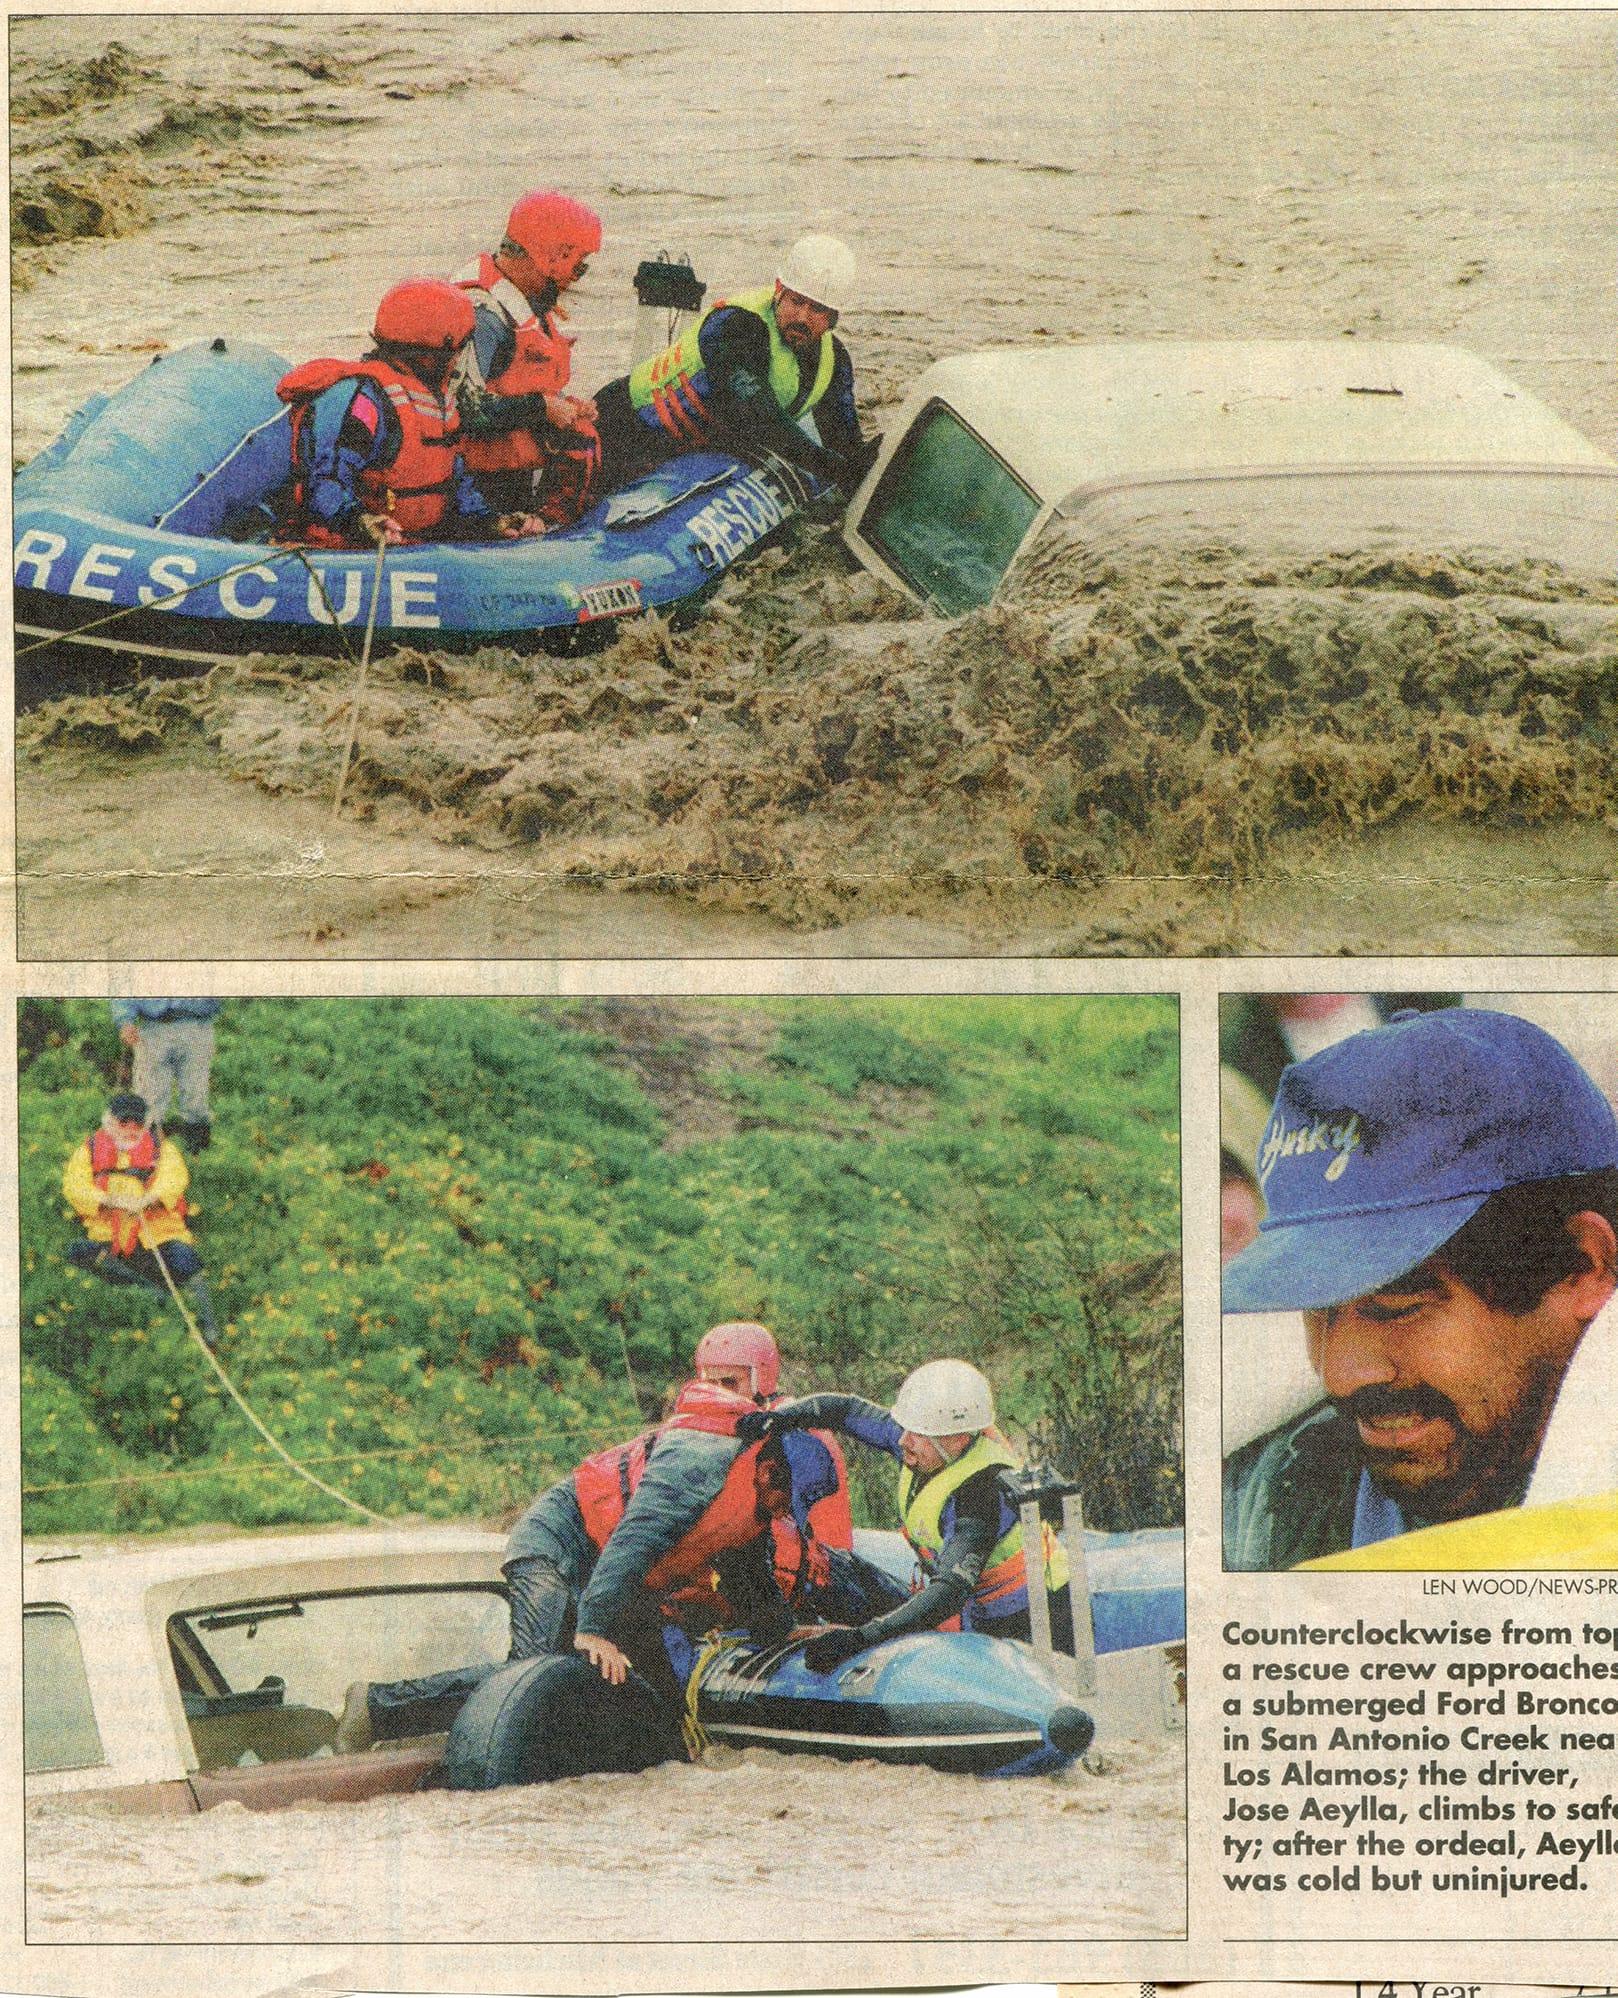 Flood rescue, January 25, 1995